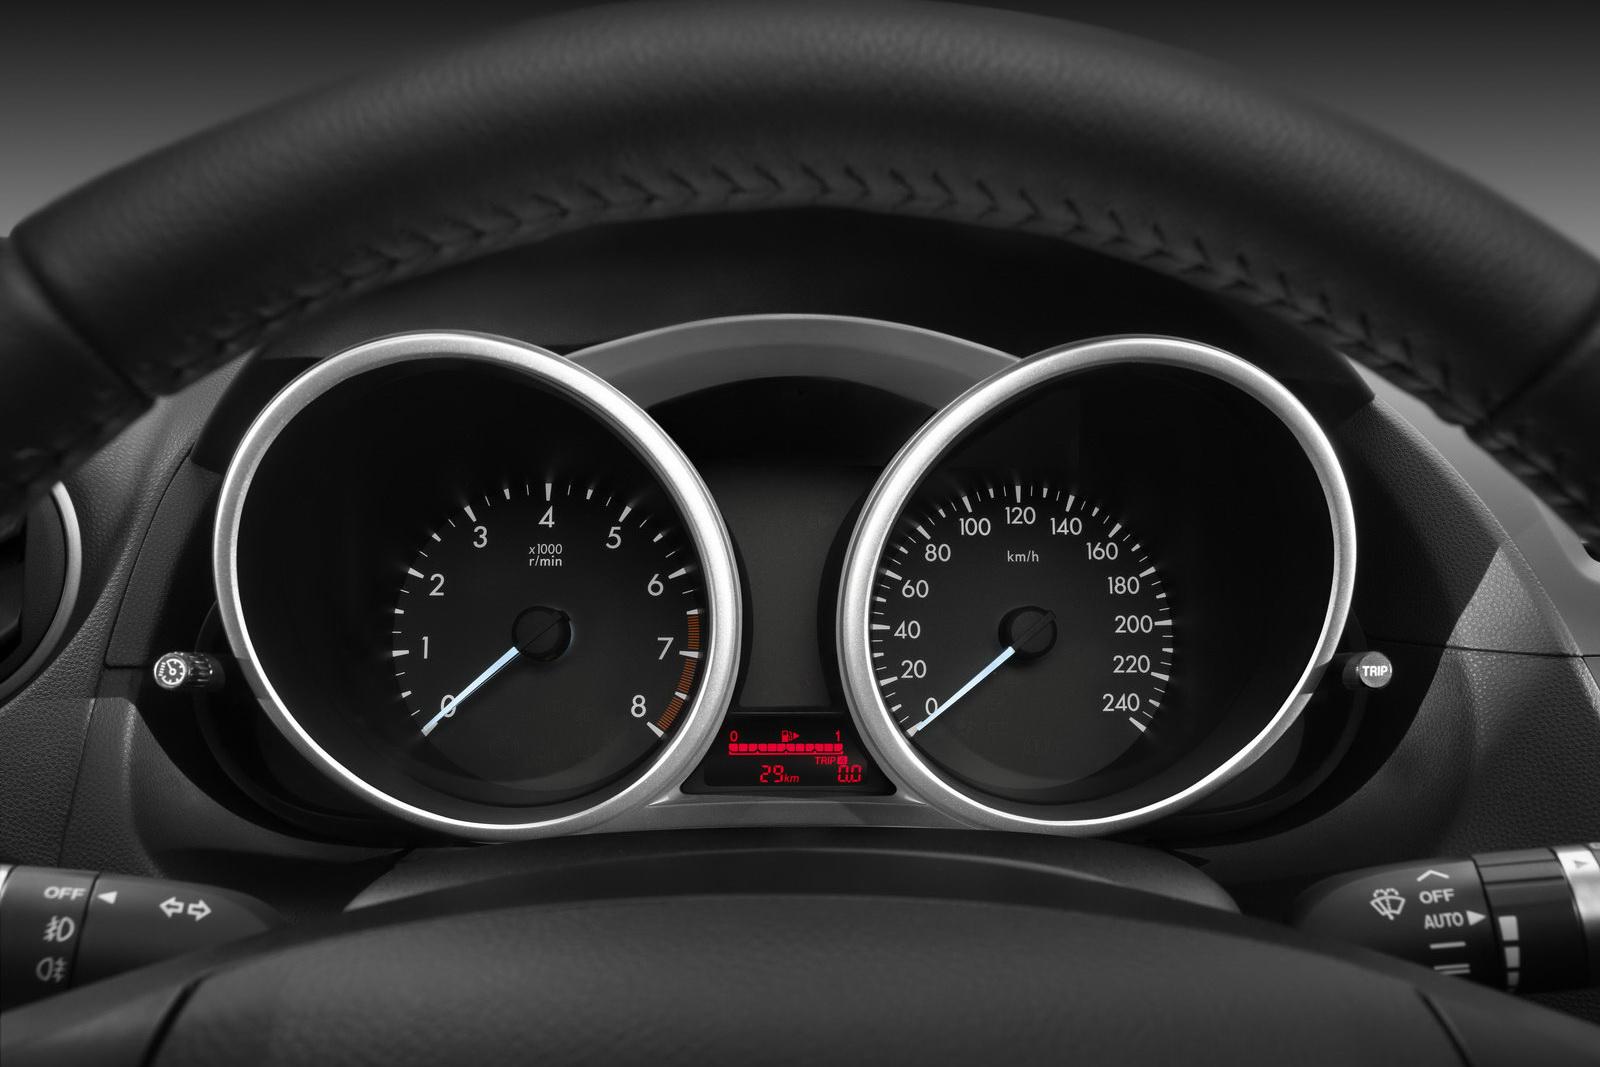 2012 Mazda 5 Interior Photos Reviews Specifications Today24news